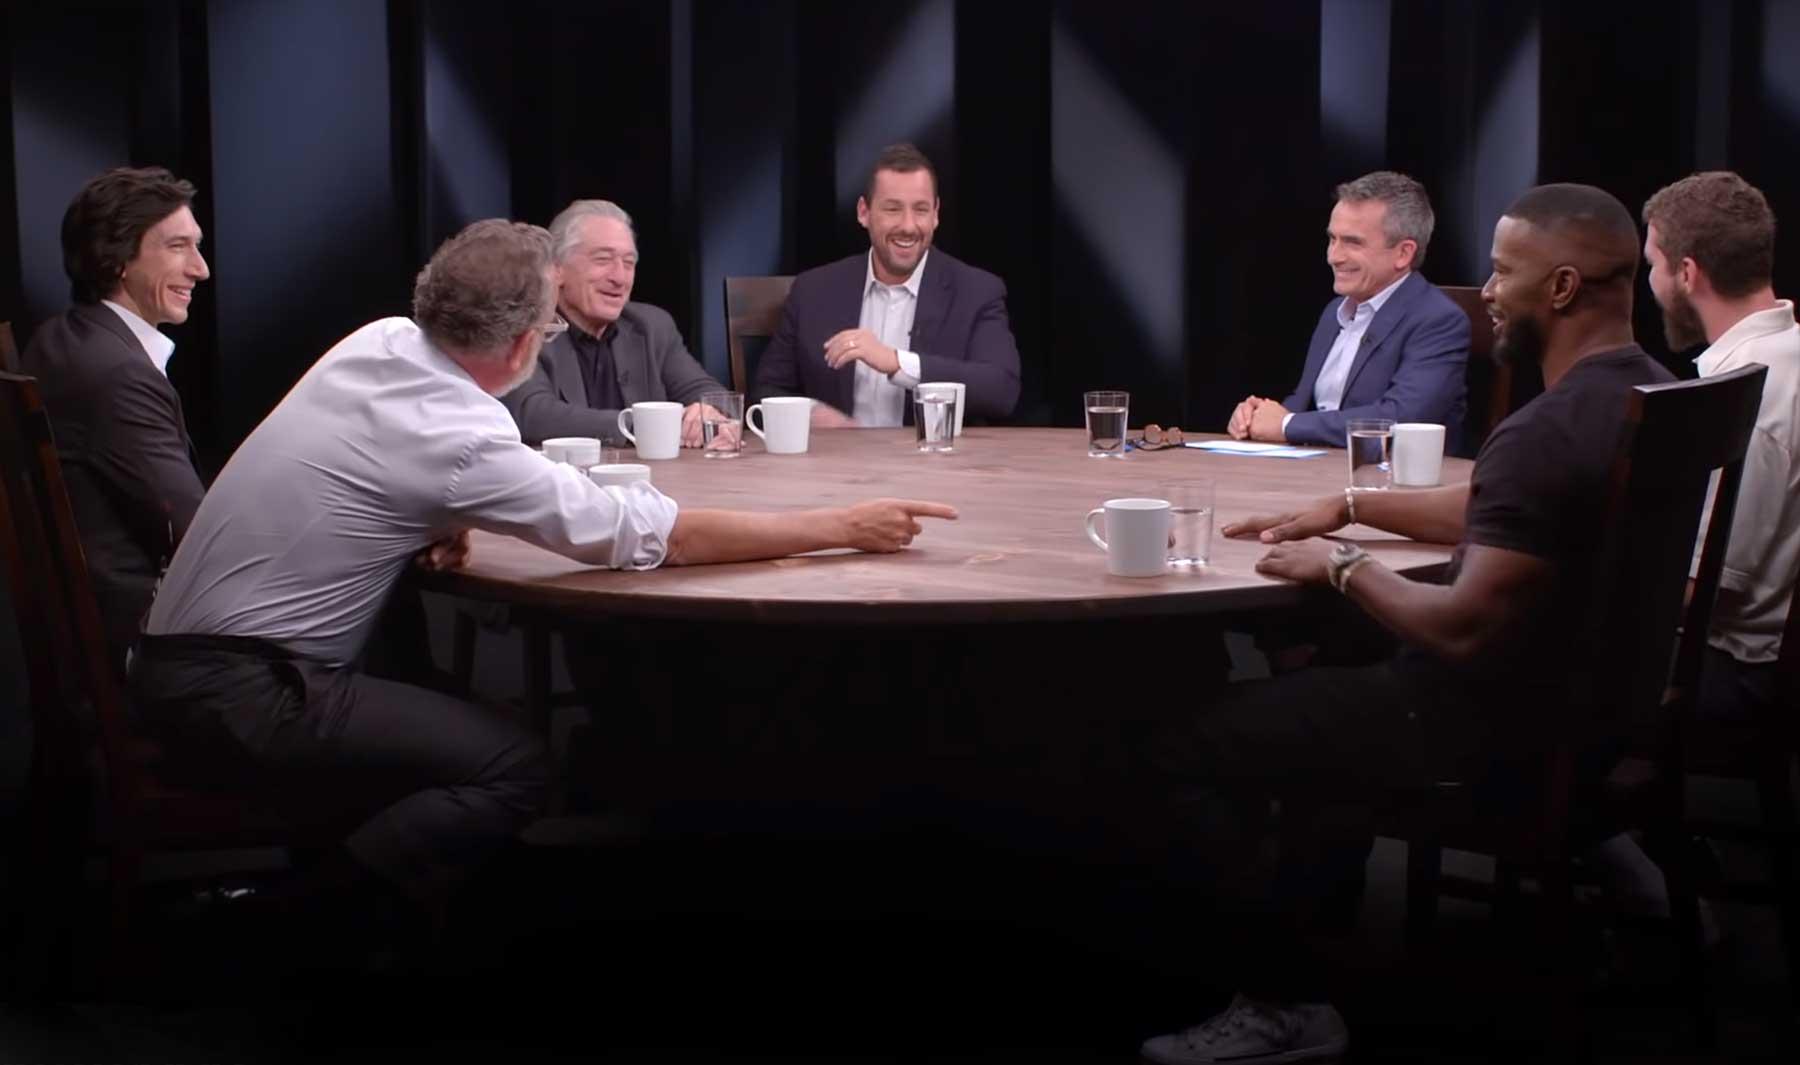 Tom Hanks, Robert De Niro, Adam Driver, Shia LaBeouf, Jamie Foxx & Adam Sandler an einem Tisch